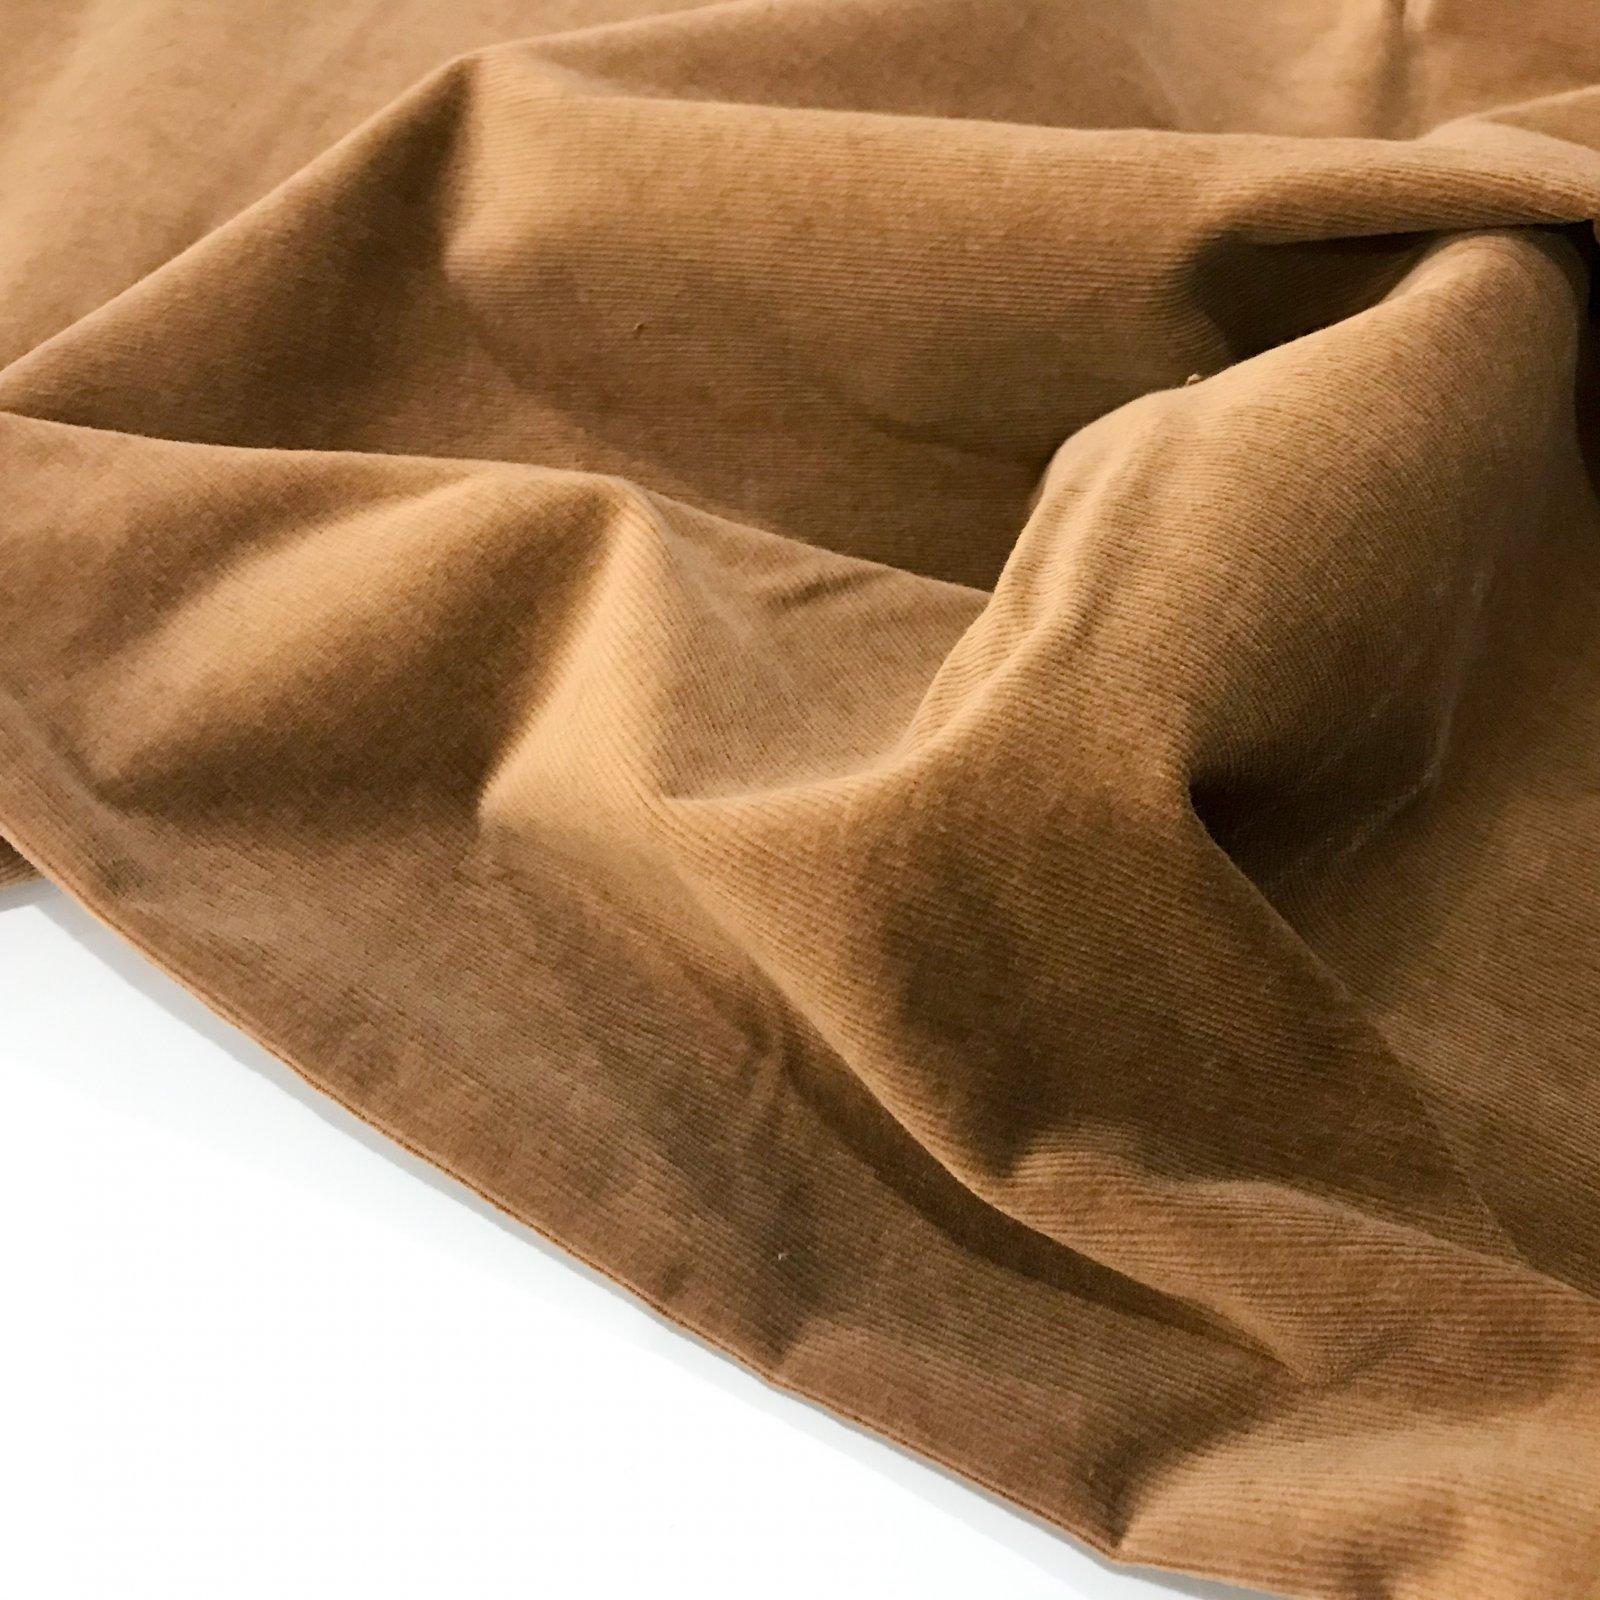 Cotton - Stretch 21 Wale Corduroy - Wood